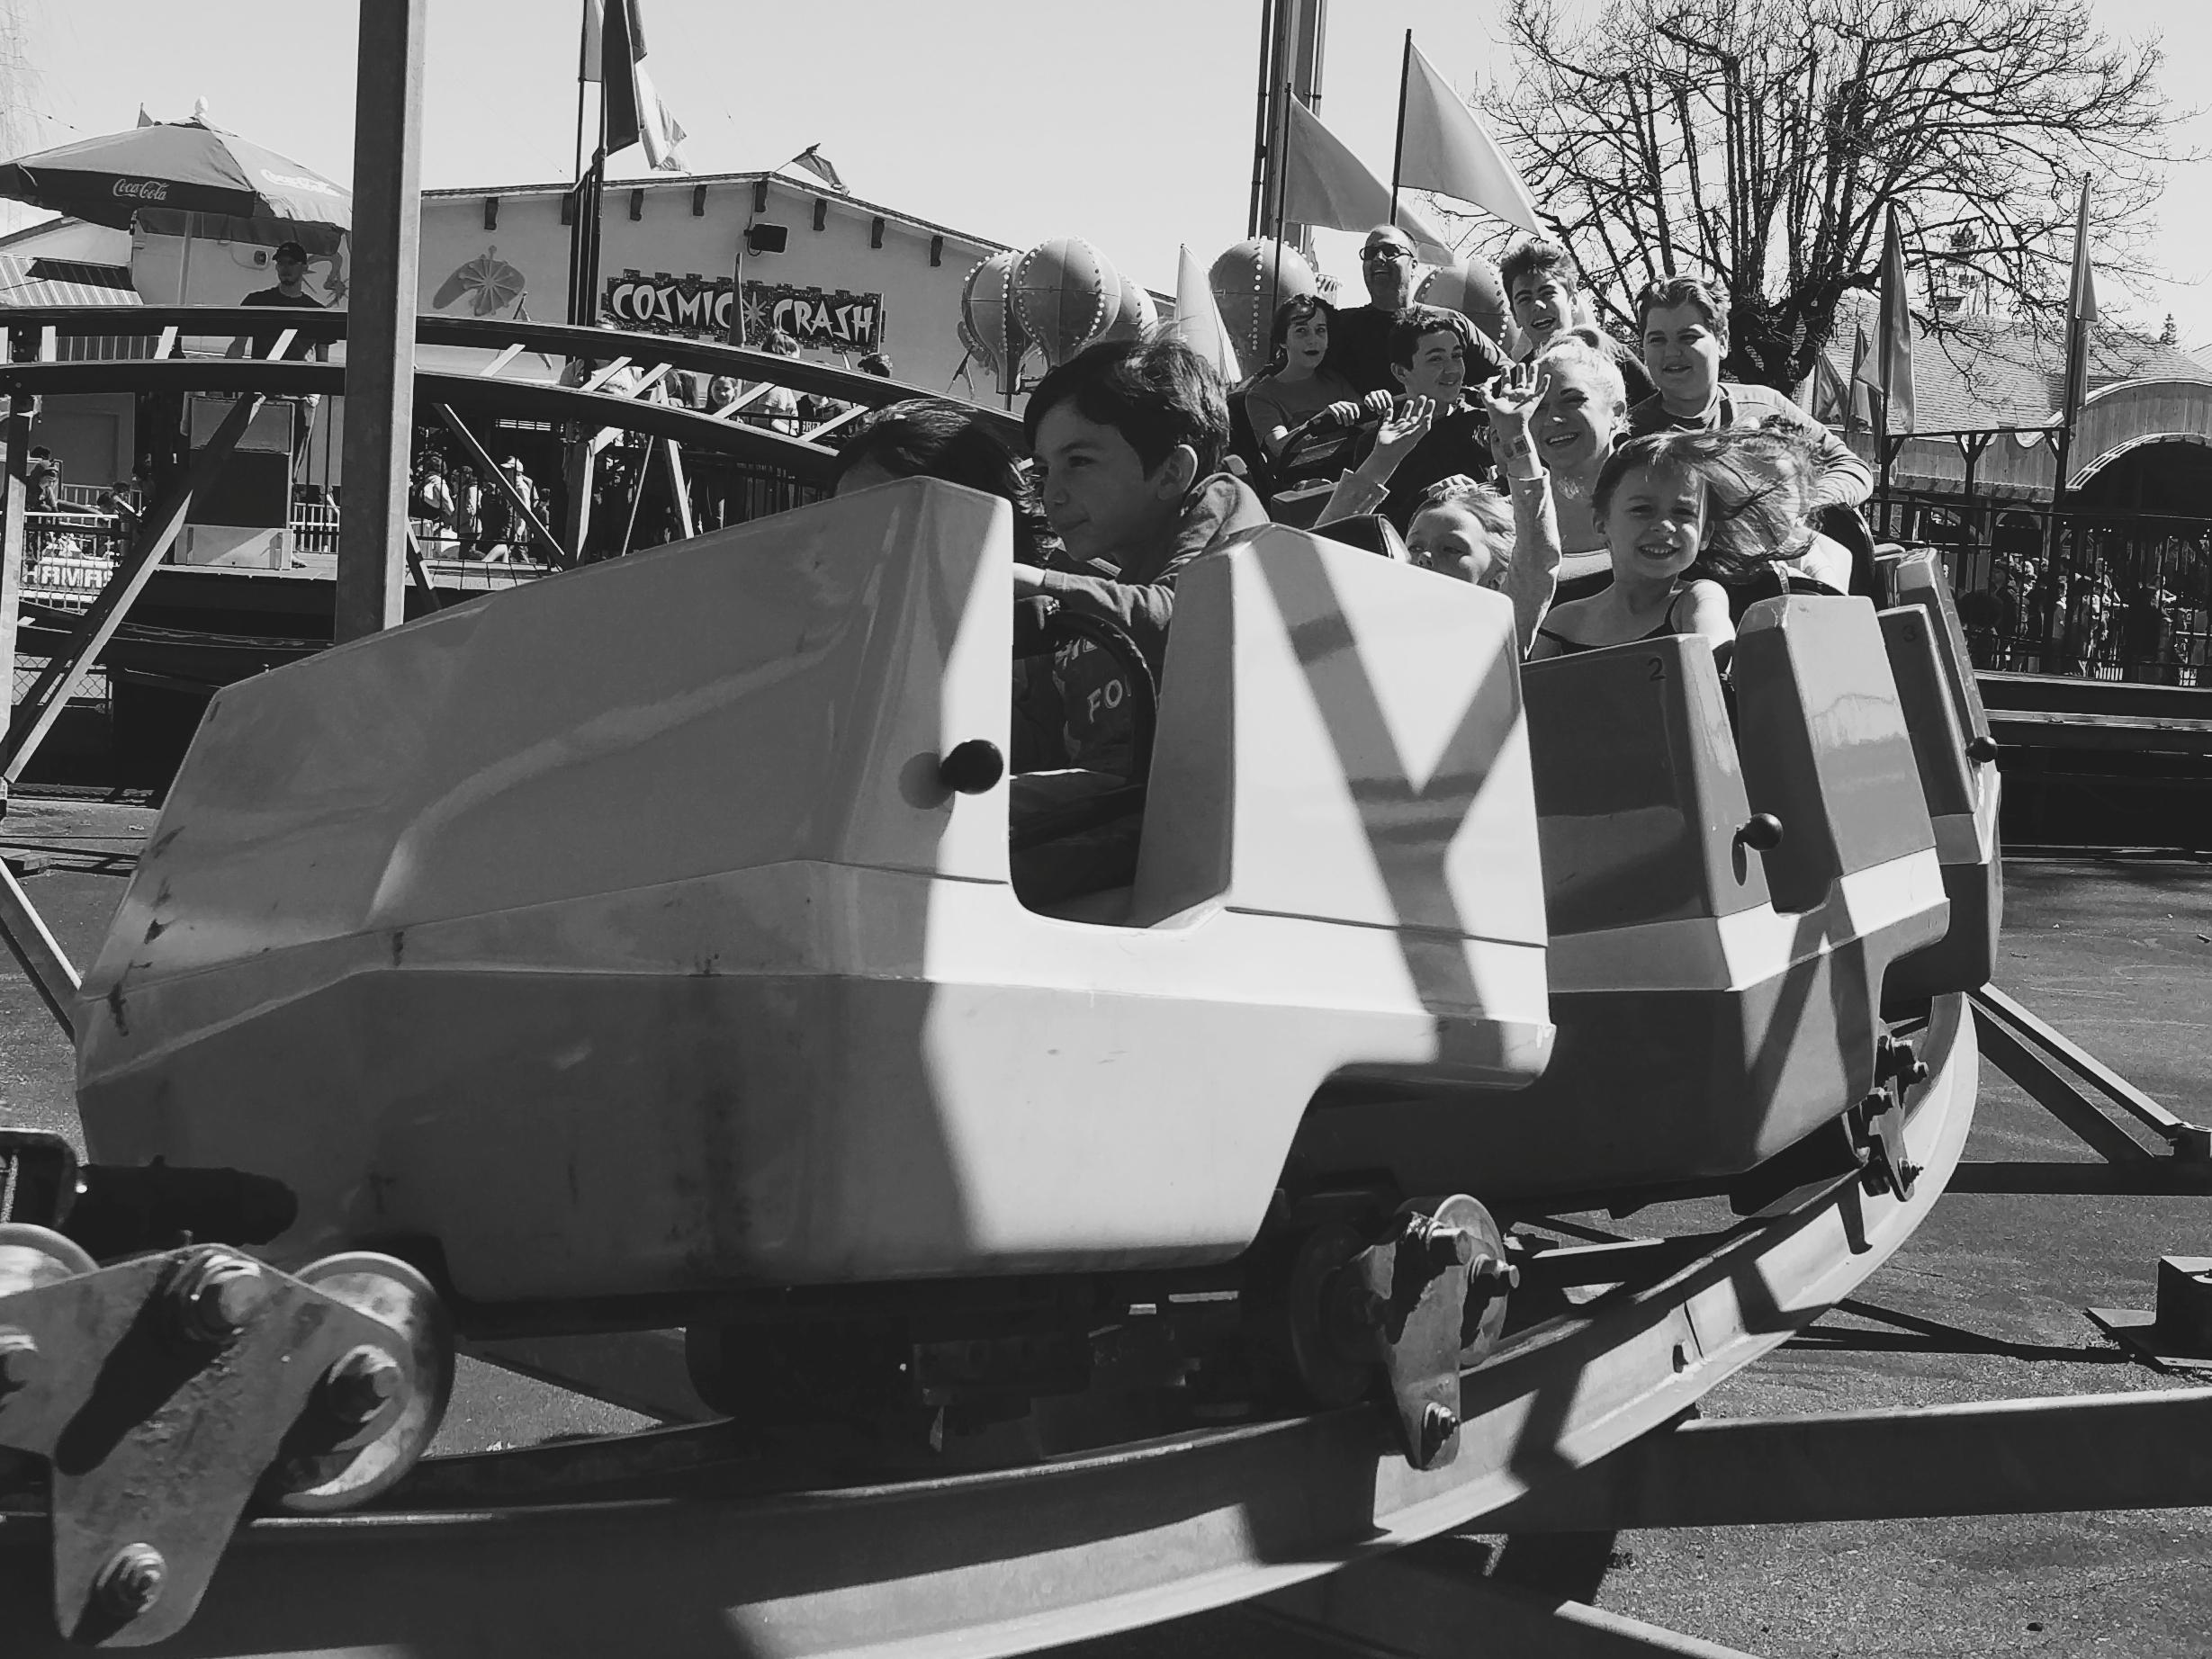 king-roller-coaster-2019.jpg